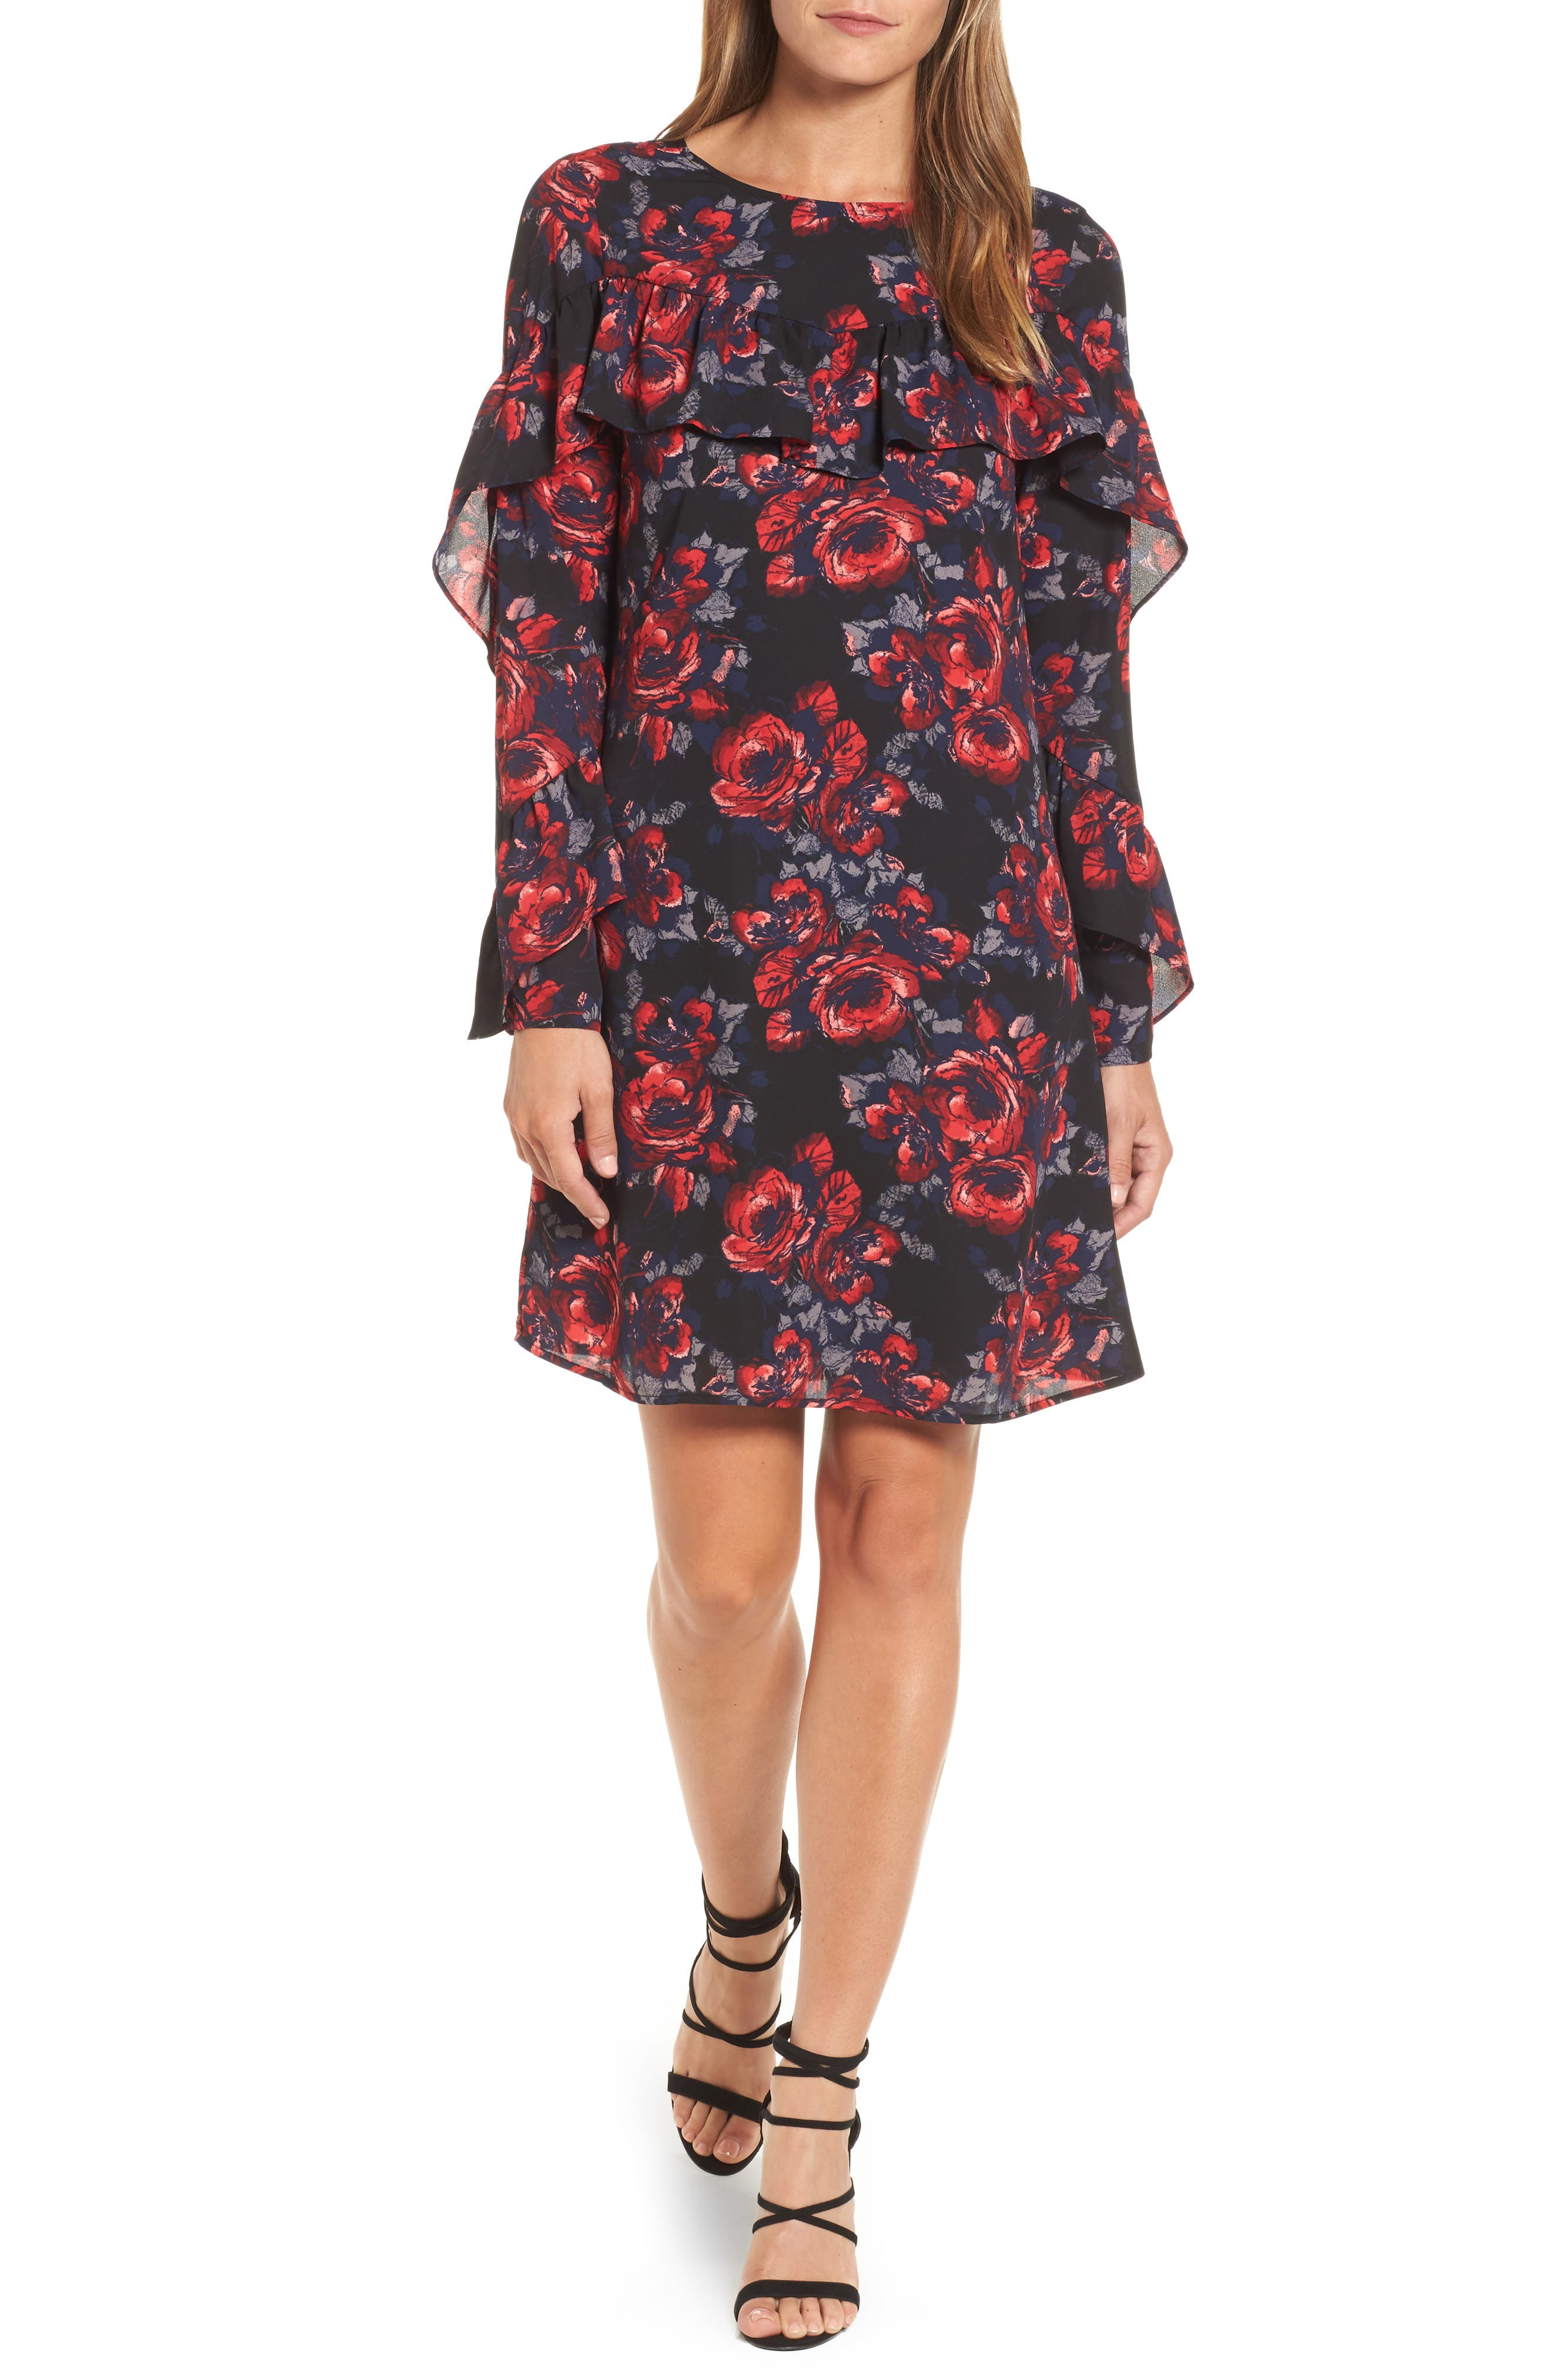 Alternate Image 1 Selected - Halogen® Ruffle Shift Dress (Regular & Petite)